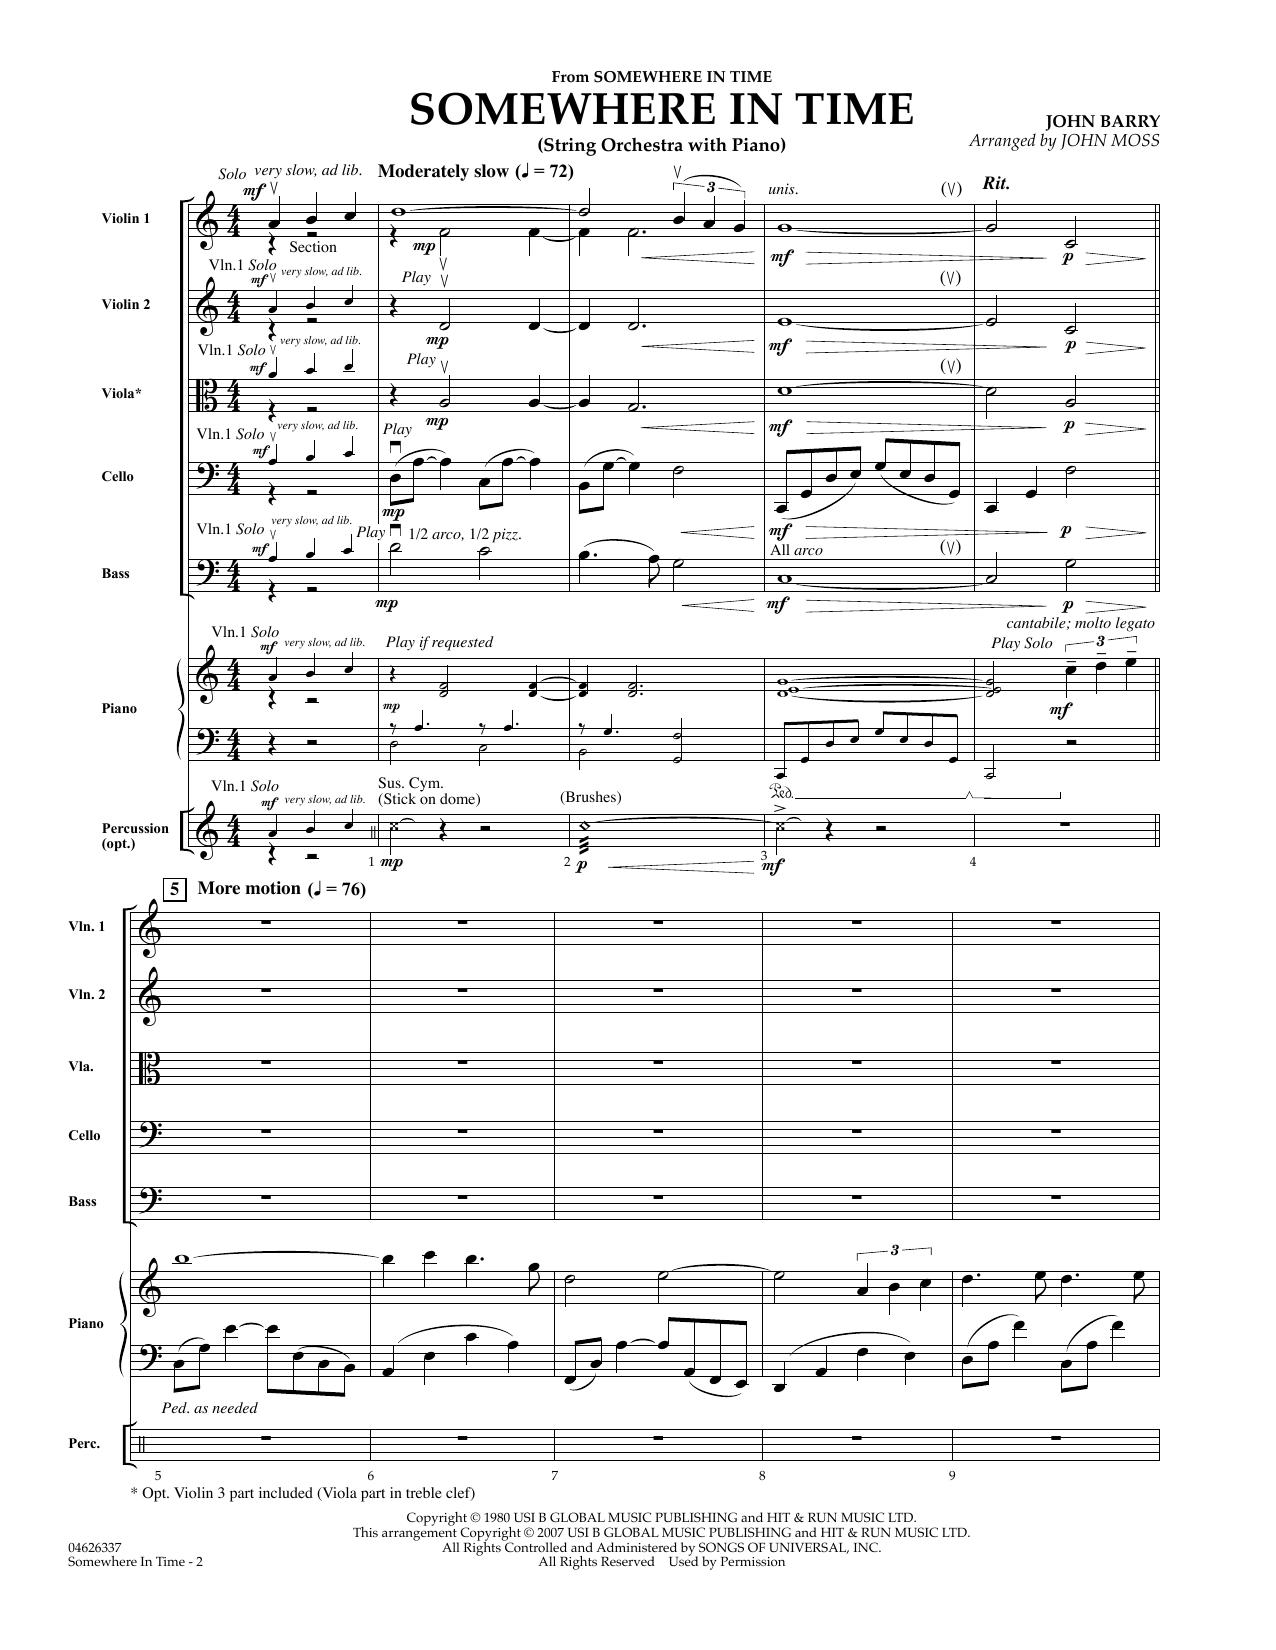 Somewhere in Time - Full Score sheet music